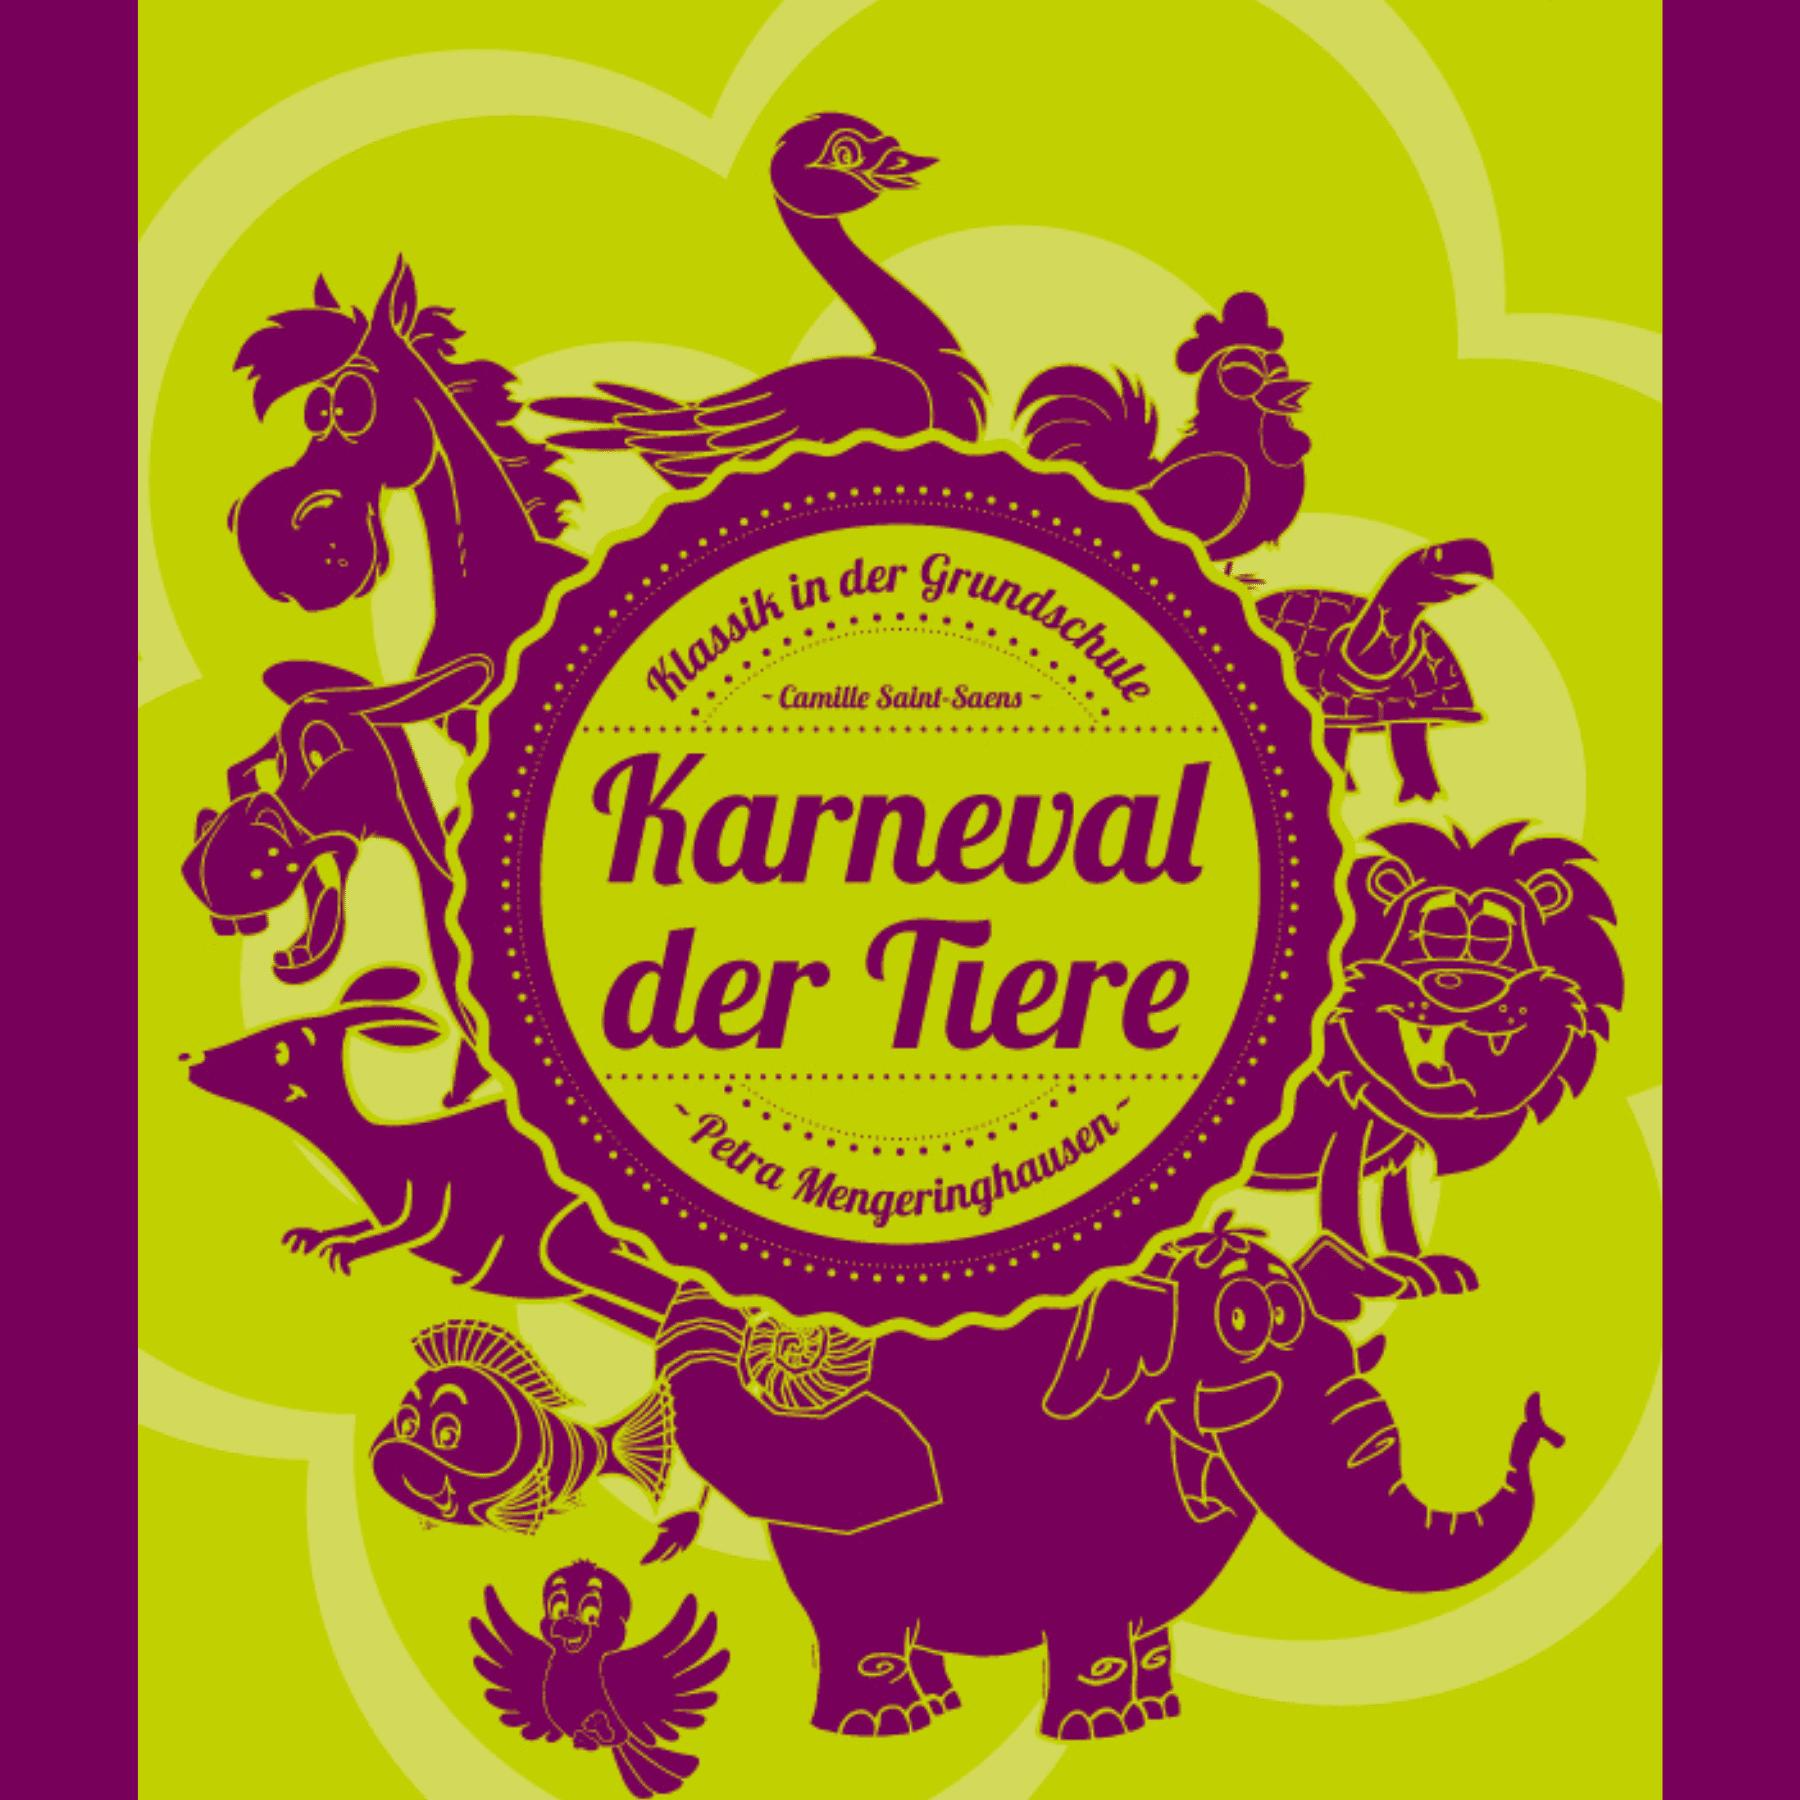 karneval der tiere in der grundschule  material  gratis